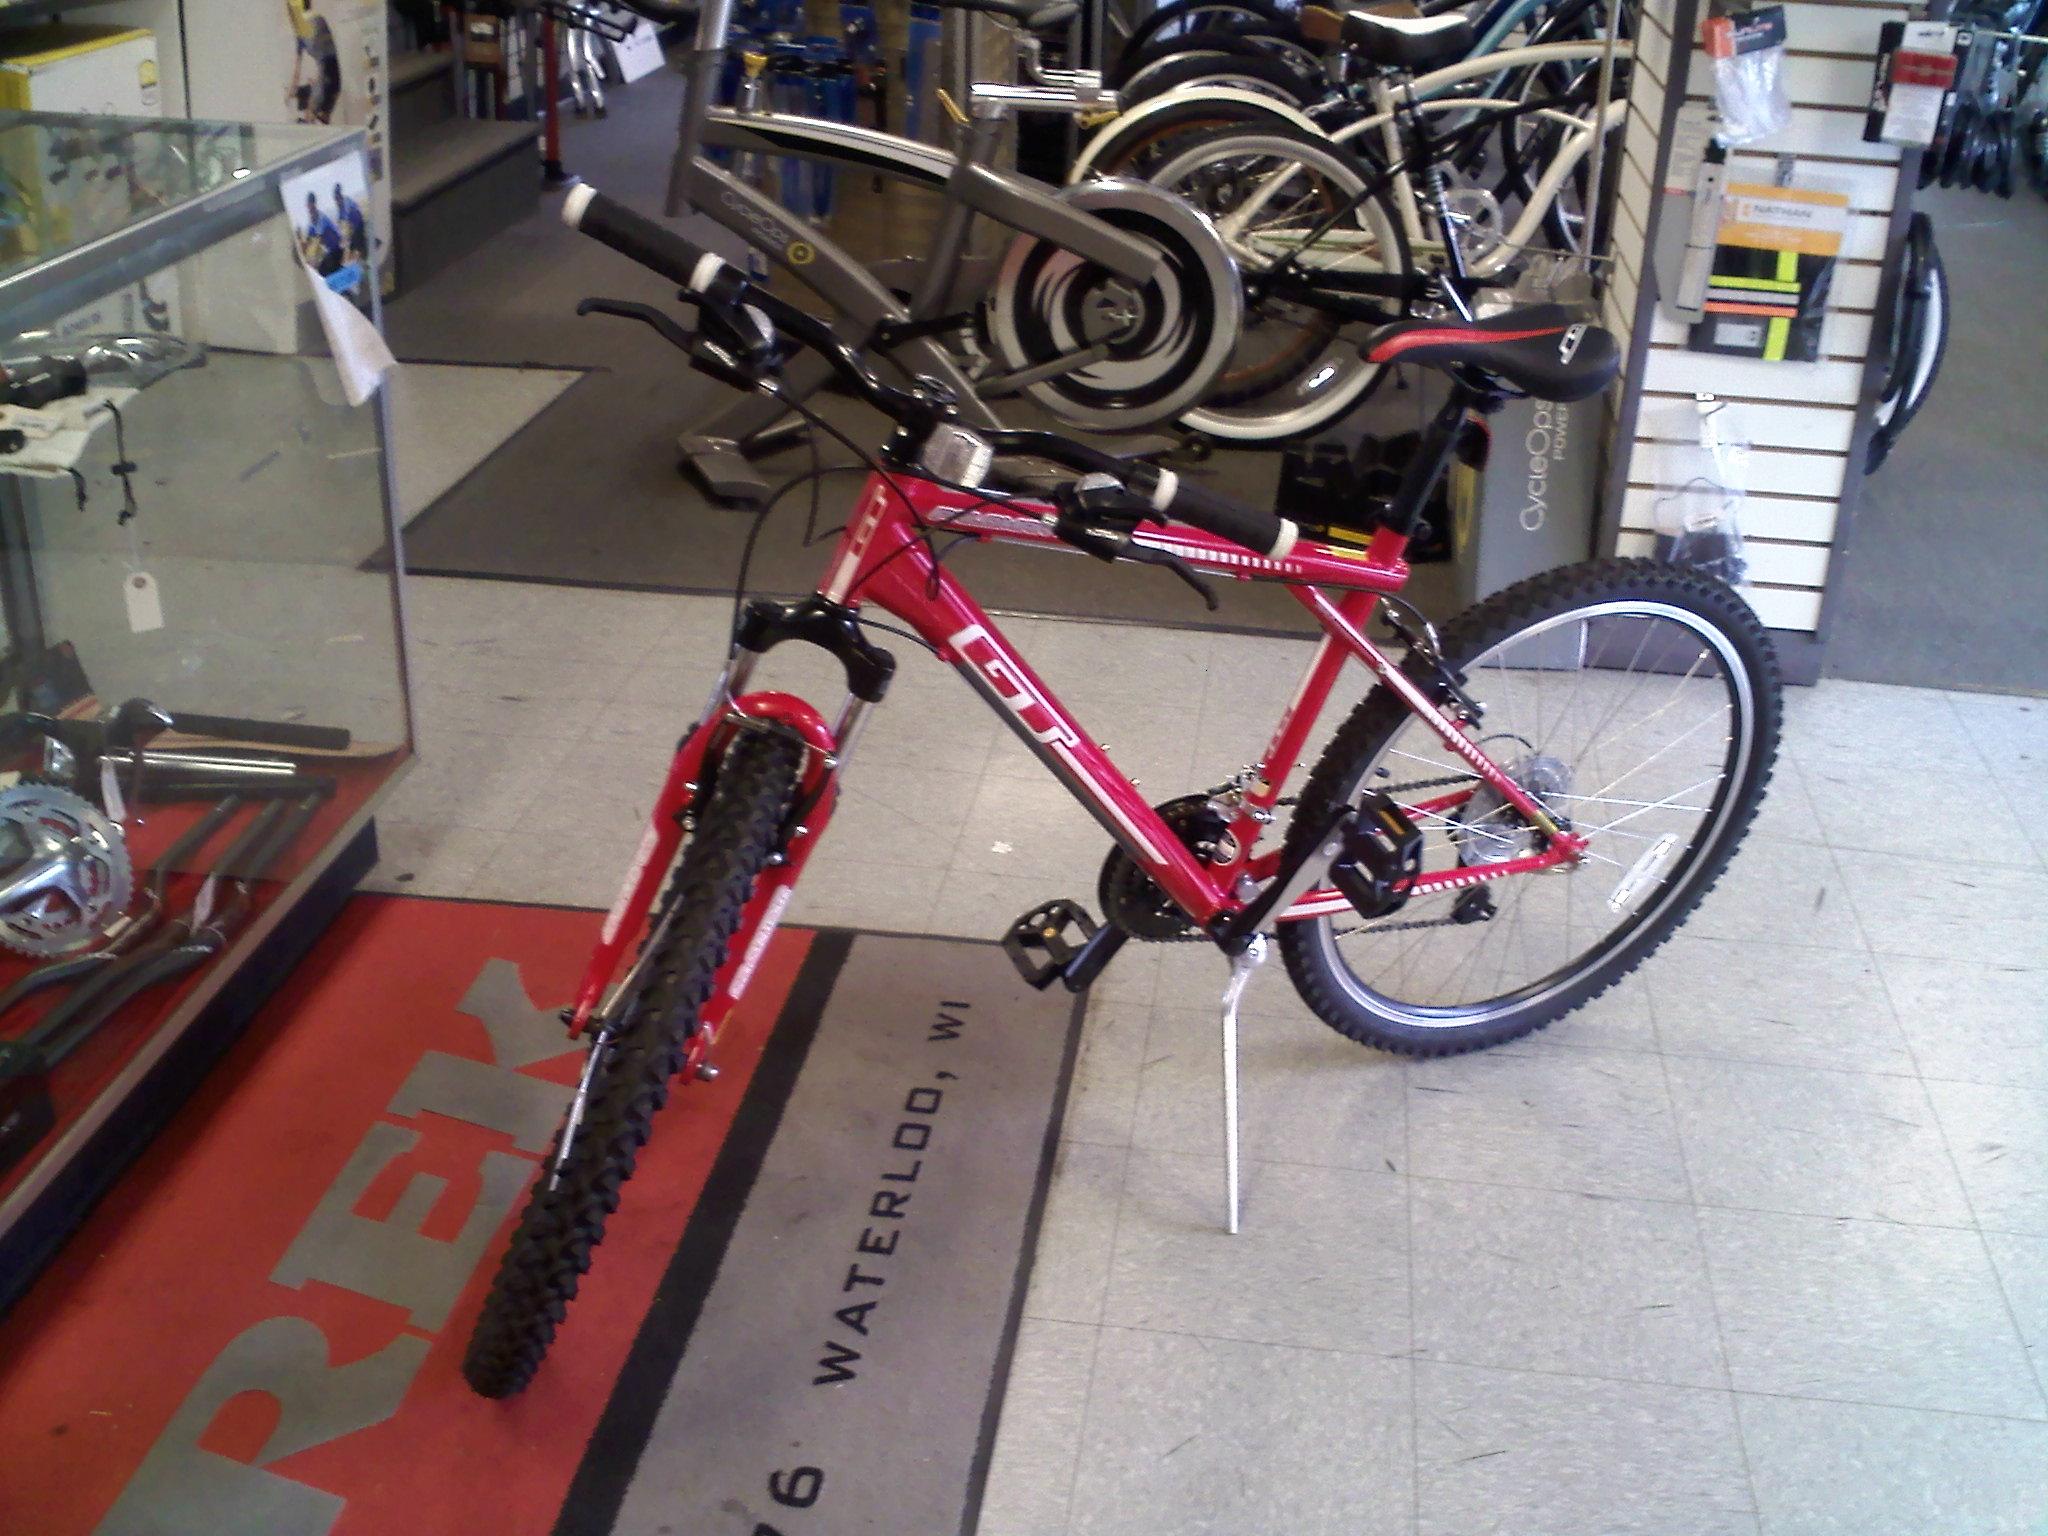 Bikes Gt 1993 Cirque steel GT Palomar MTB